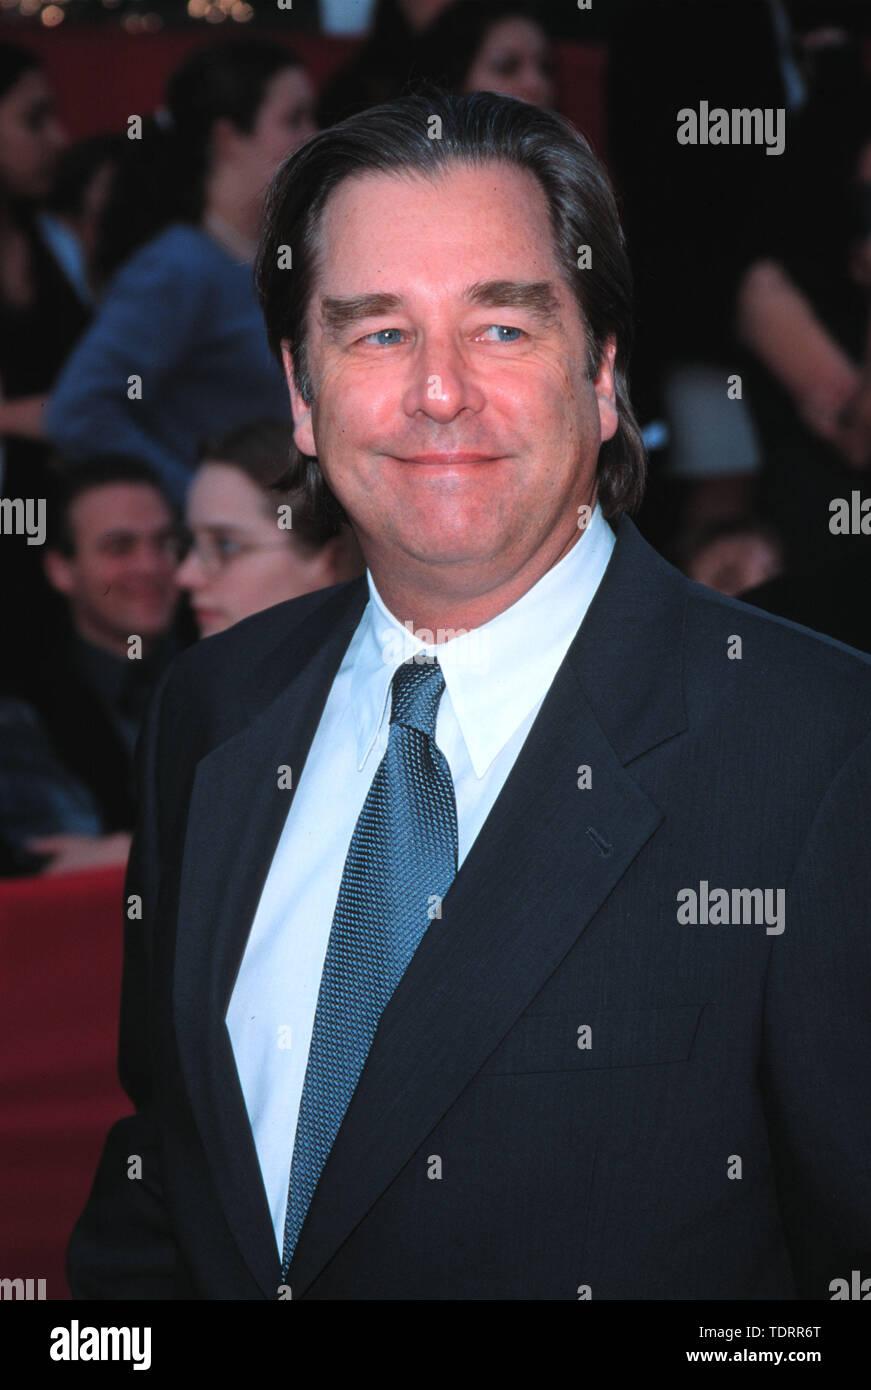 Mar 05, 2000; Los Angeles, CA, USA; Actor JEFF BRIDGES @ 2000 TV Guide Awards..  (Credit Image: © Chris Delmas/ZUMA Wire) - Stock Image